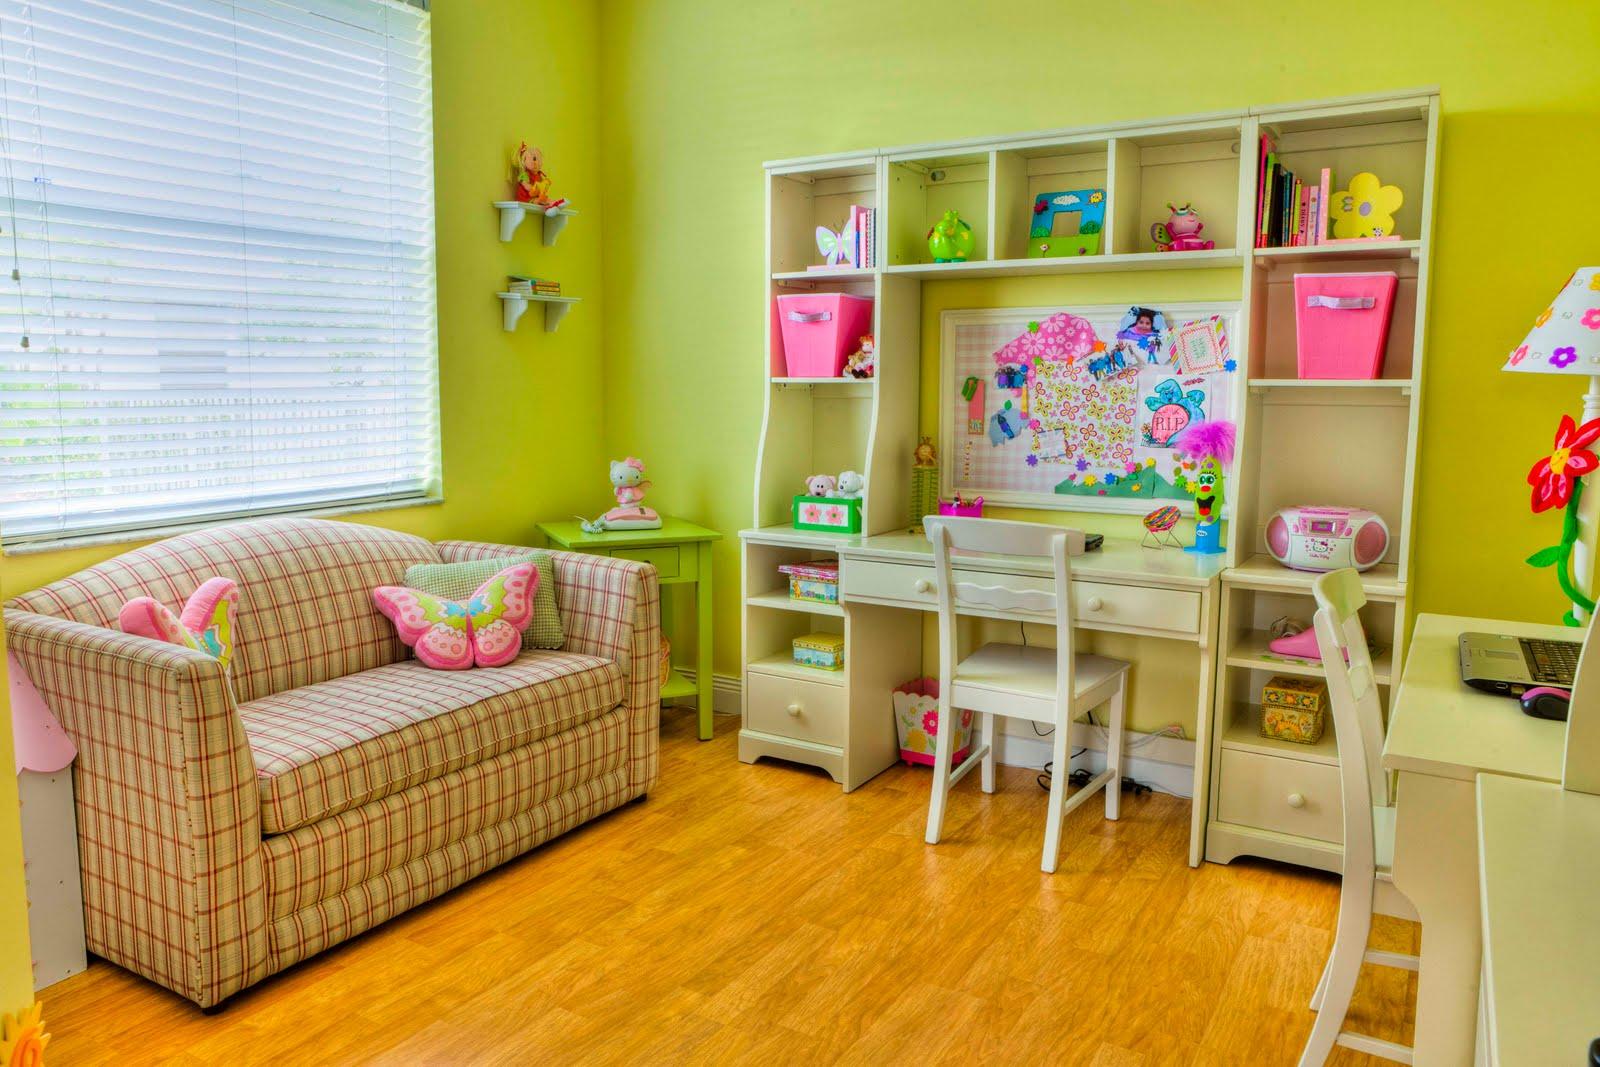 7 Inspiring Kid Room Color Options For Your Little Ones: تصاميم غرف اطفال باللون الاخضر جميلة